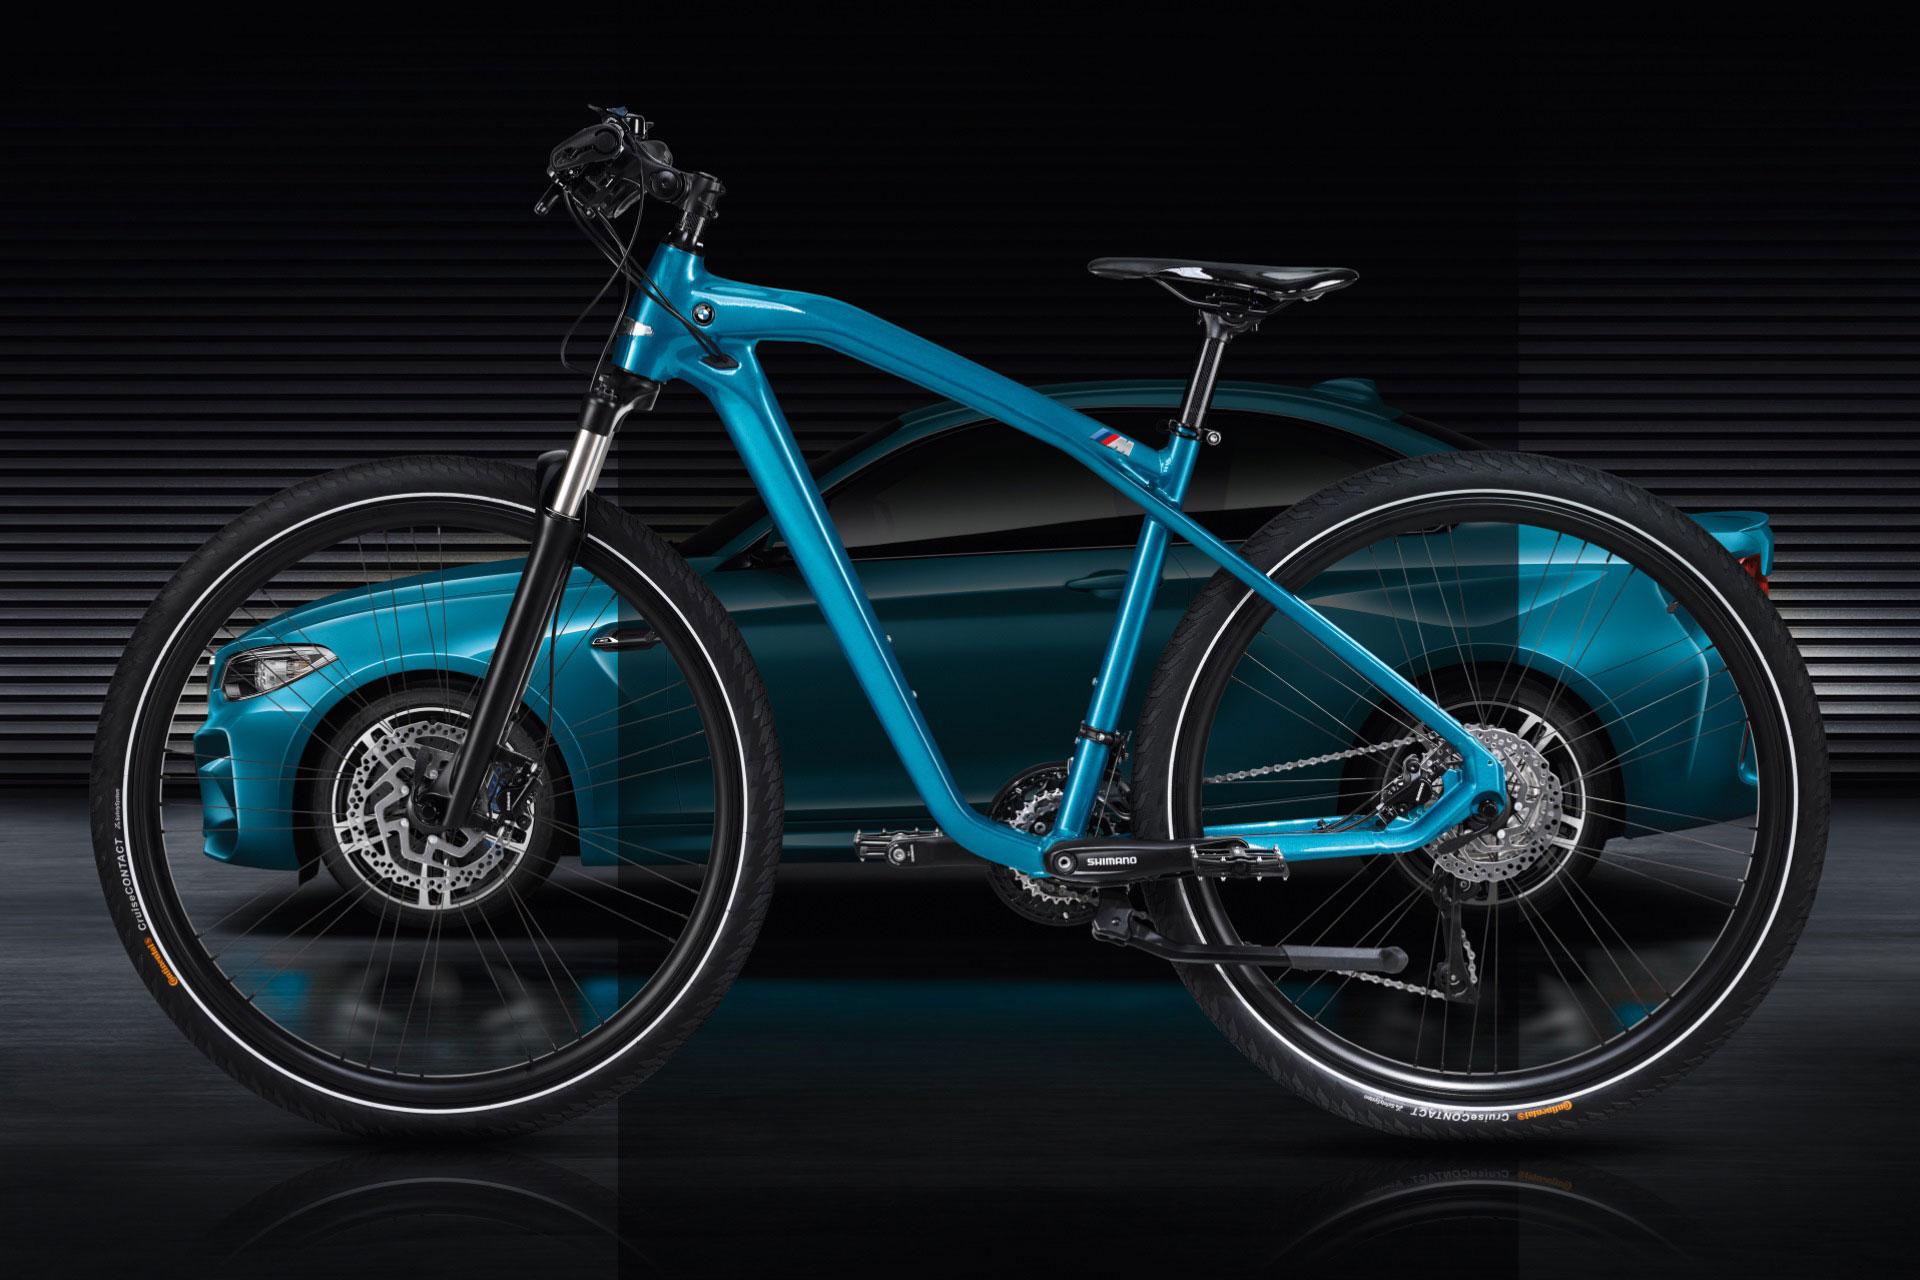 BMW-Cruise-M-Bike-Limited-Edition-Long-Beach-Blue